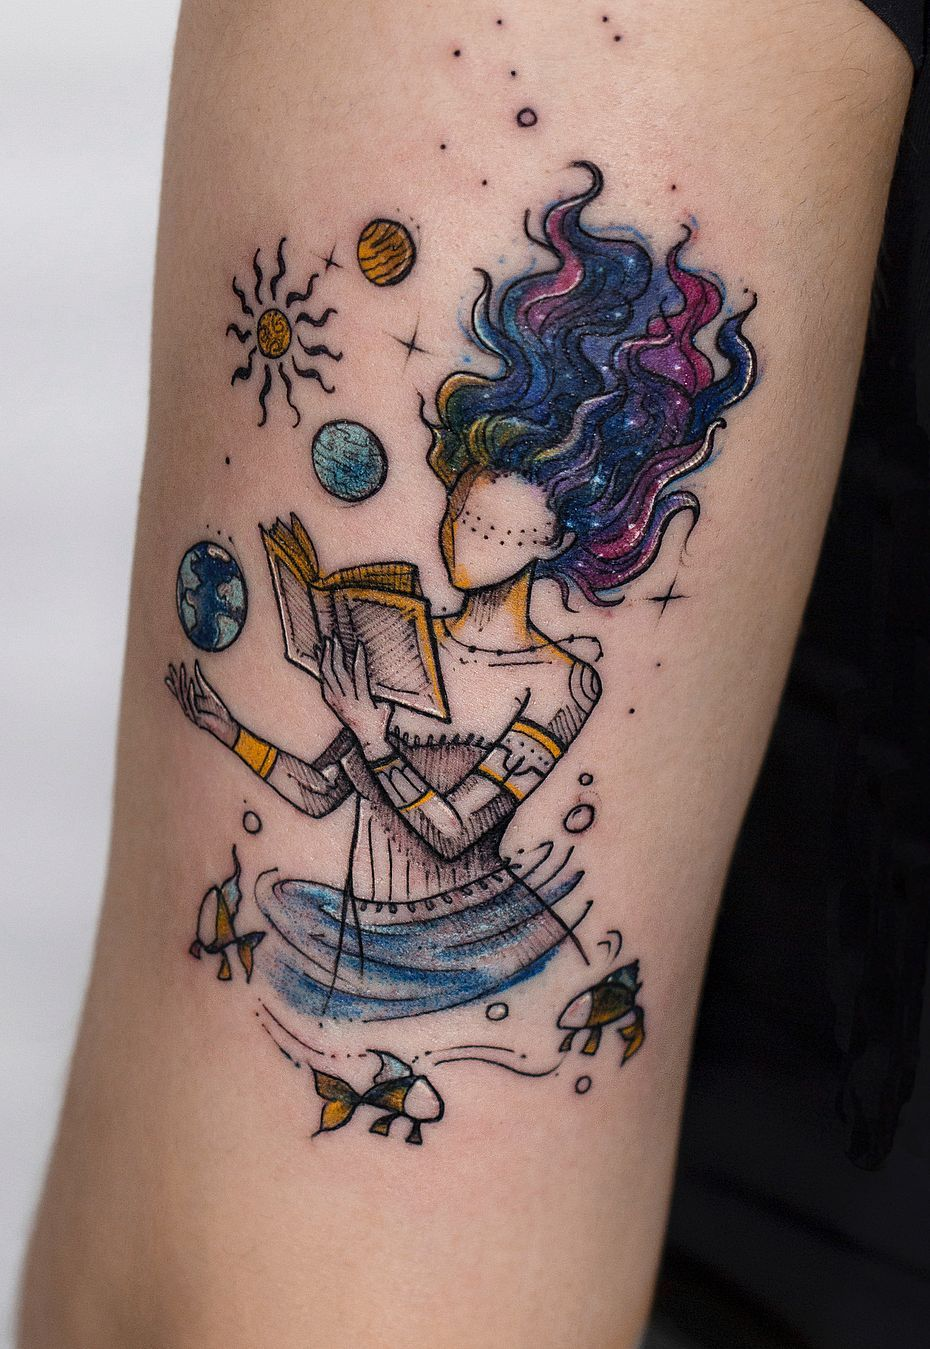 Awe-inspiring Book Tattoos for Literature Lovers